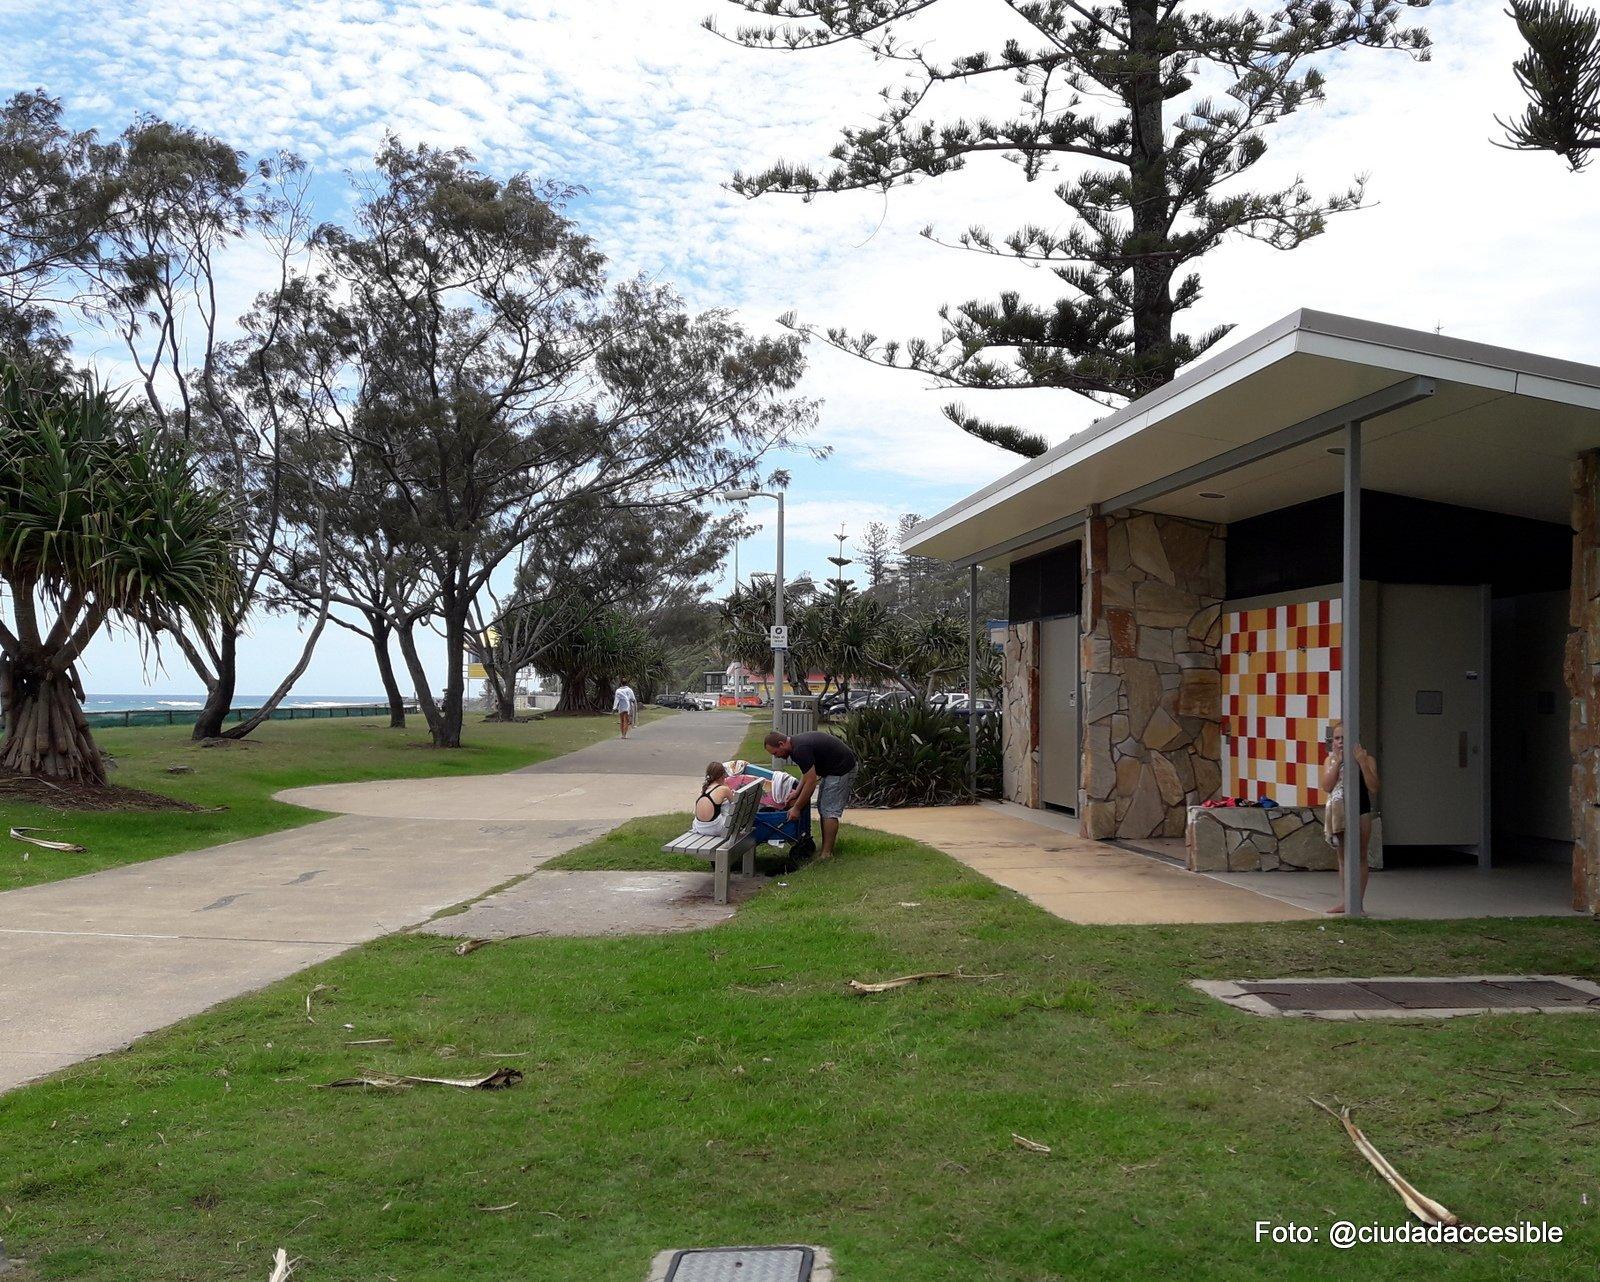 Baño público en Playa GoldCoast Brisbane